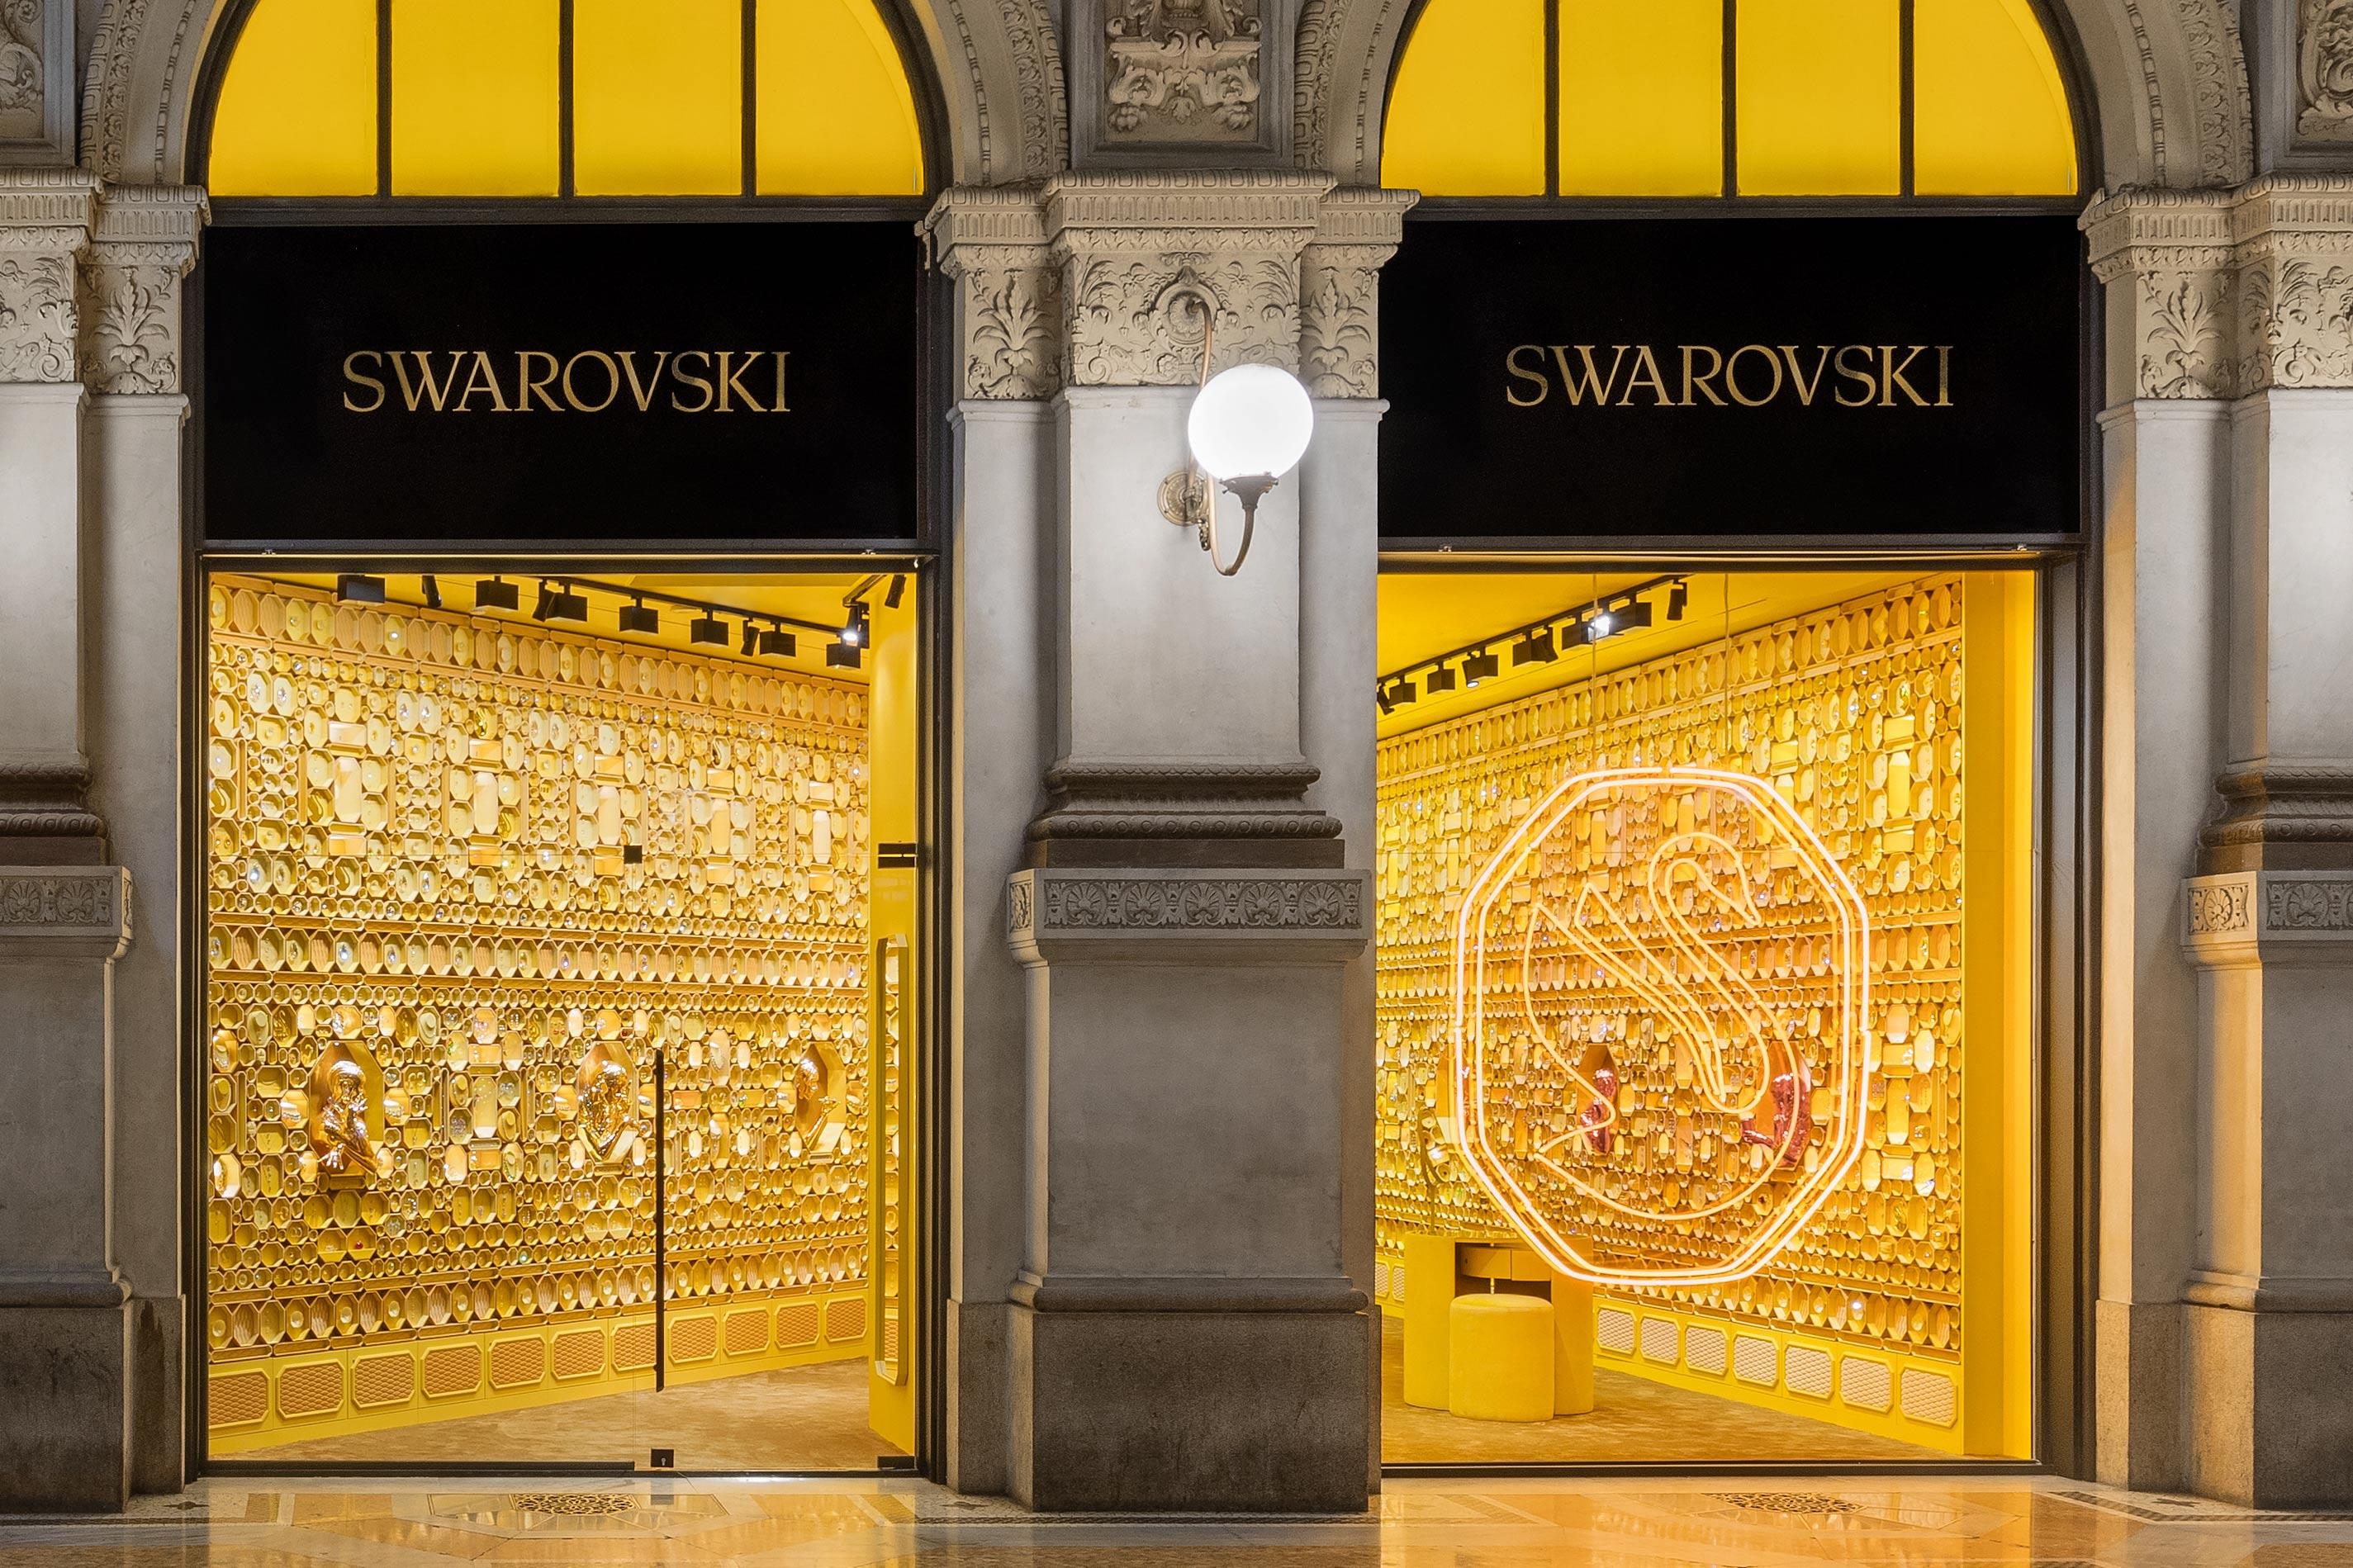 Swarovski Branding